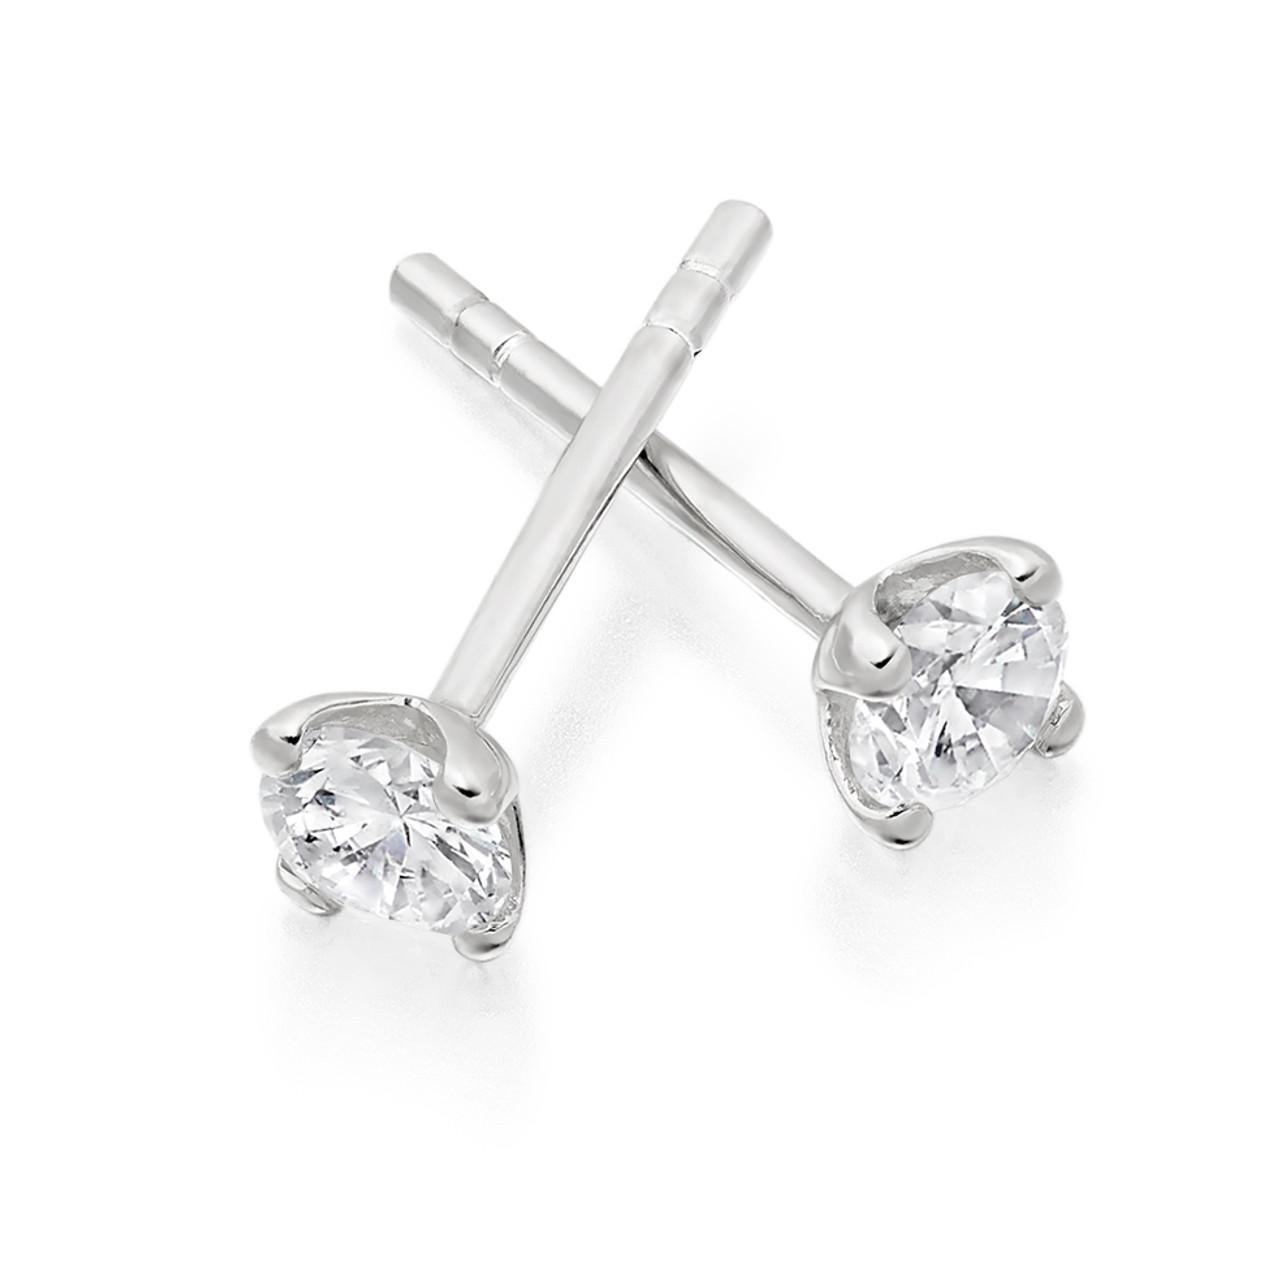 18ct White Gold 0.50ct Diamond Stud Earrings